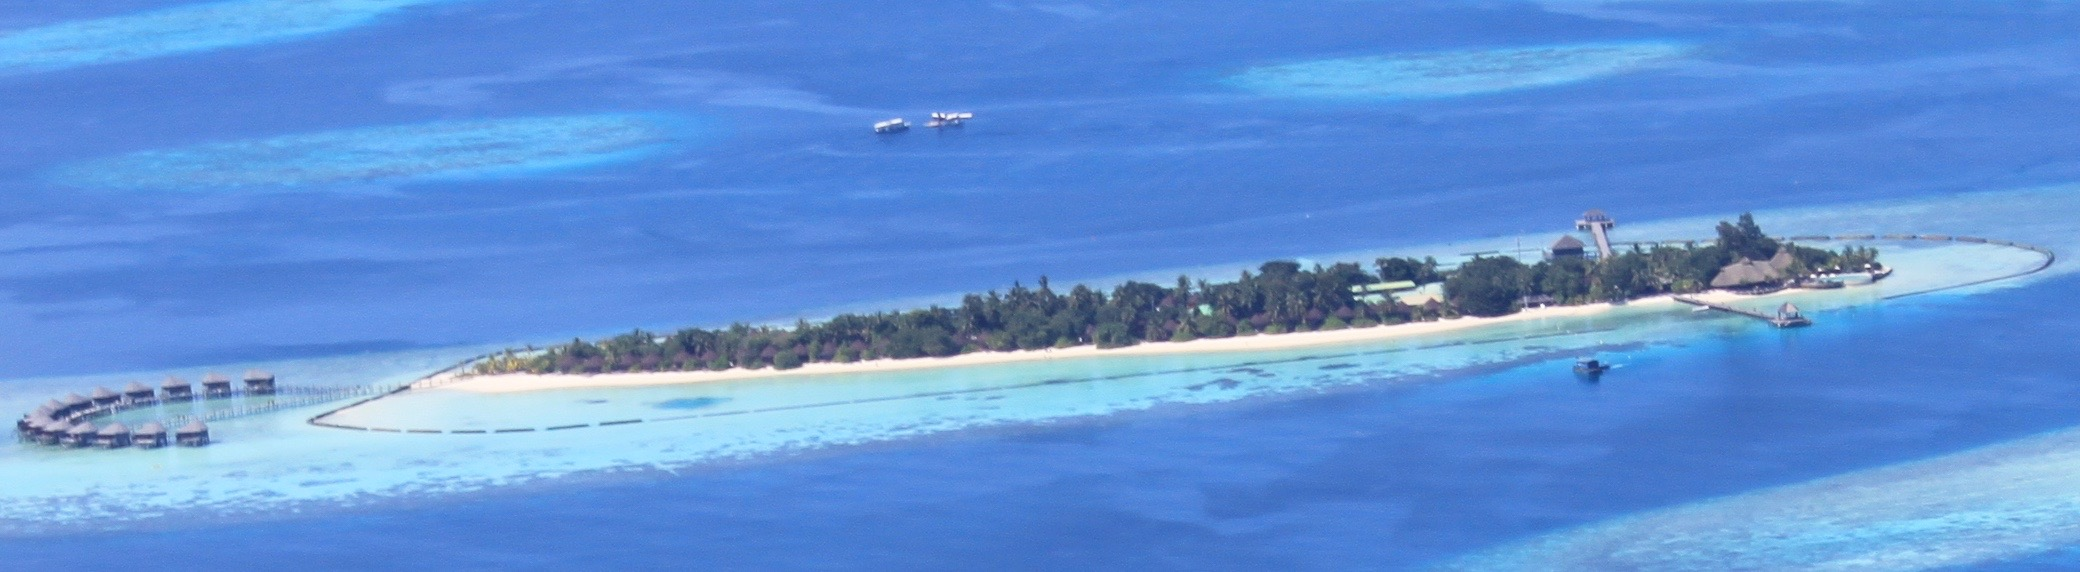 Komandoo Resort & Island from the seaplane